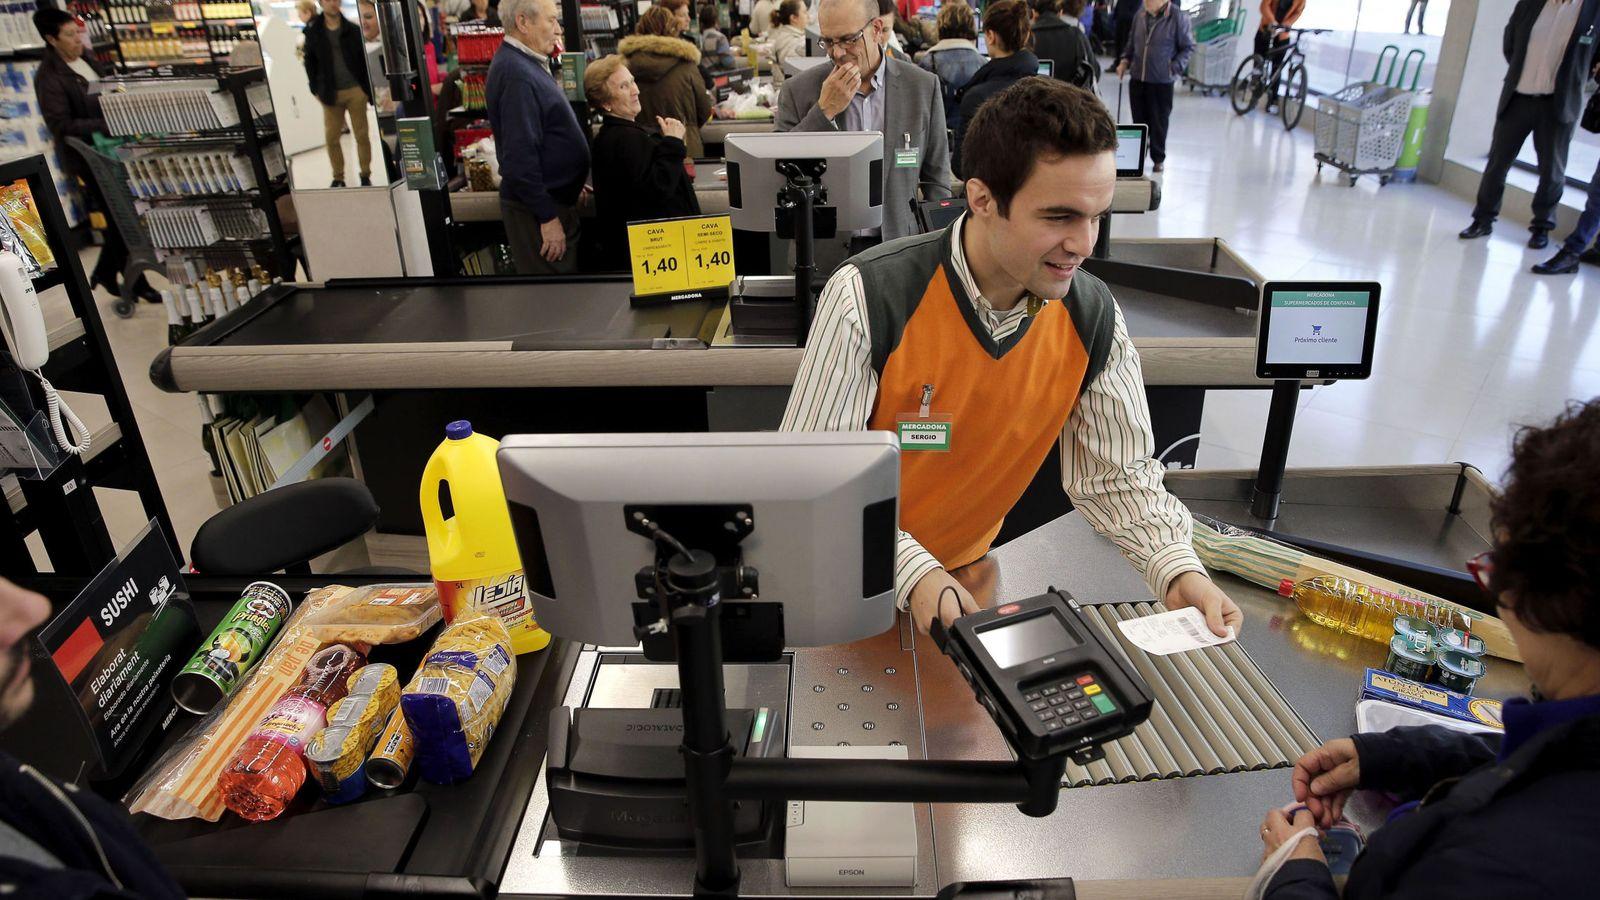 Mercadona Mercadona Ya Tiene Casi La Misma Cuota Que Carrefour Dia